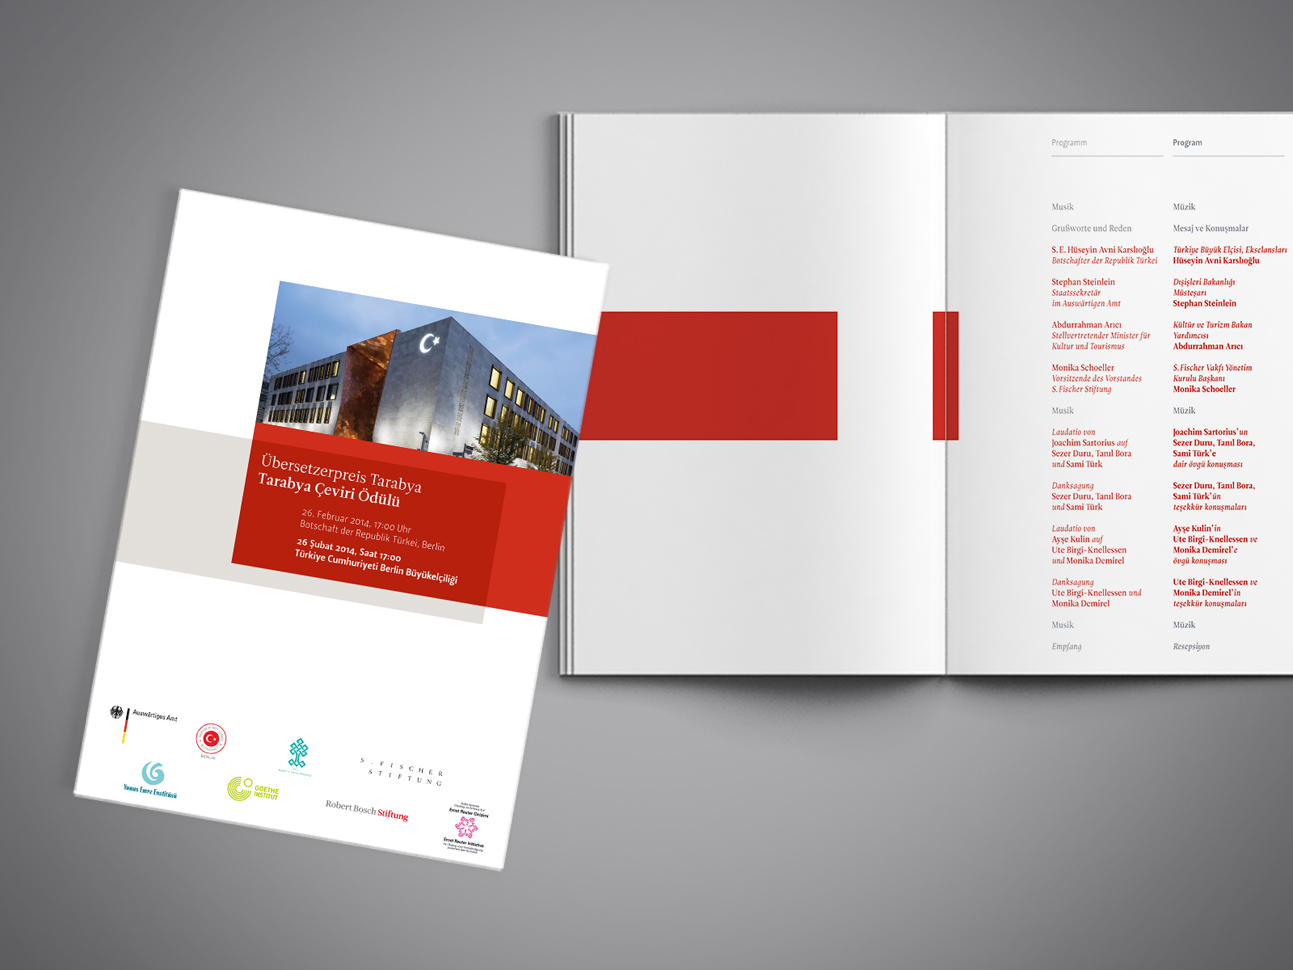 martin_zech_design_projekt_design_tarabya_programmheft